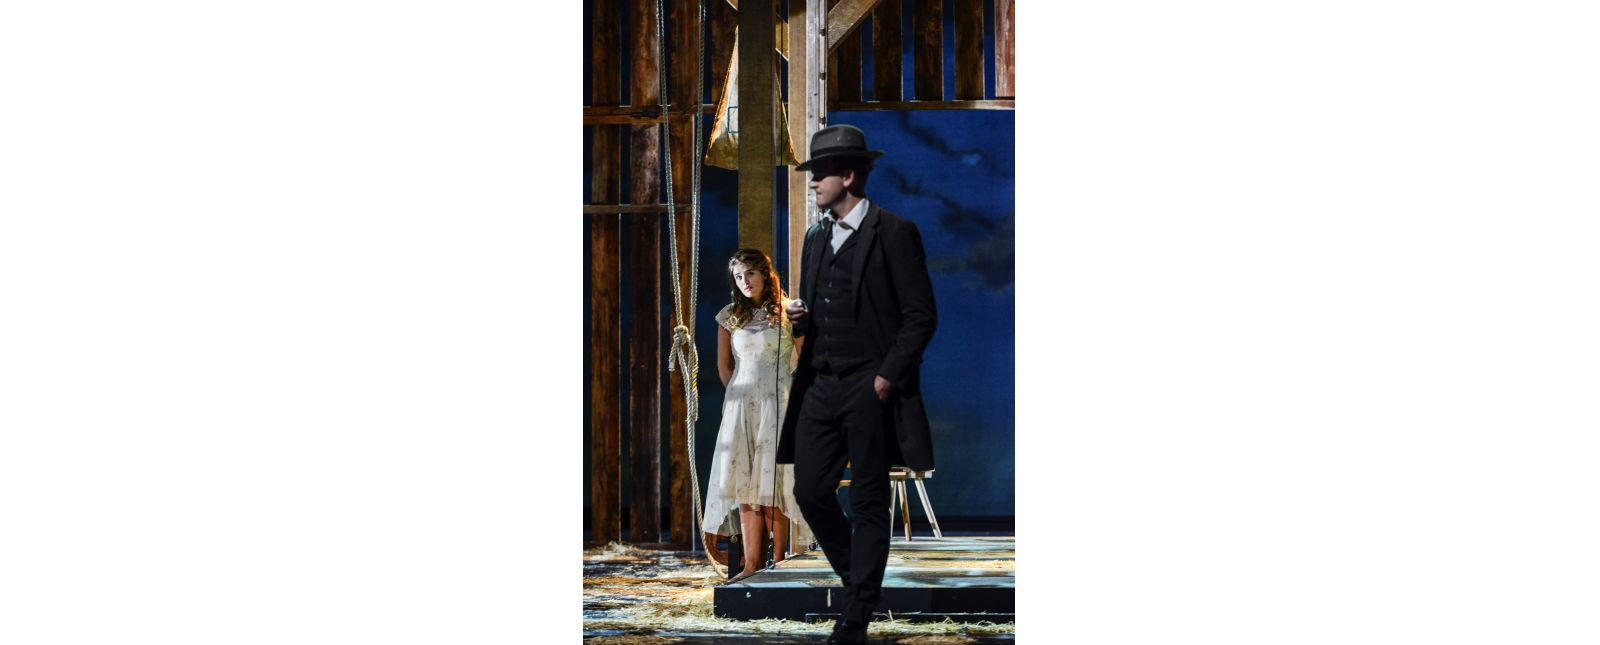 Eugen Onegin // Solen Mainguené // Michael Borth // 2018 // Tanja Dorendorf // T+T Fotografie